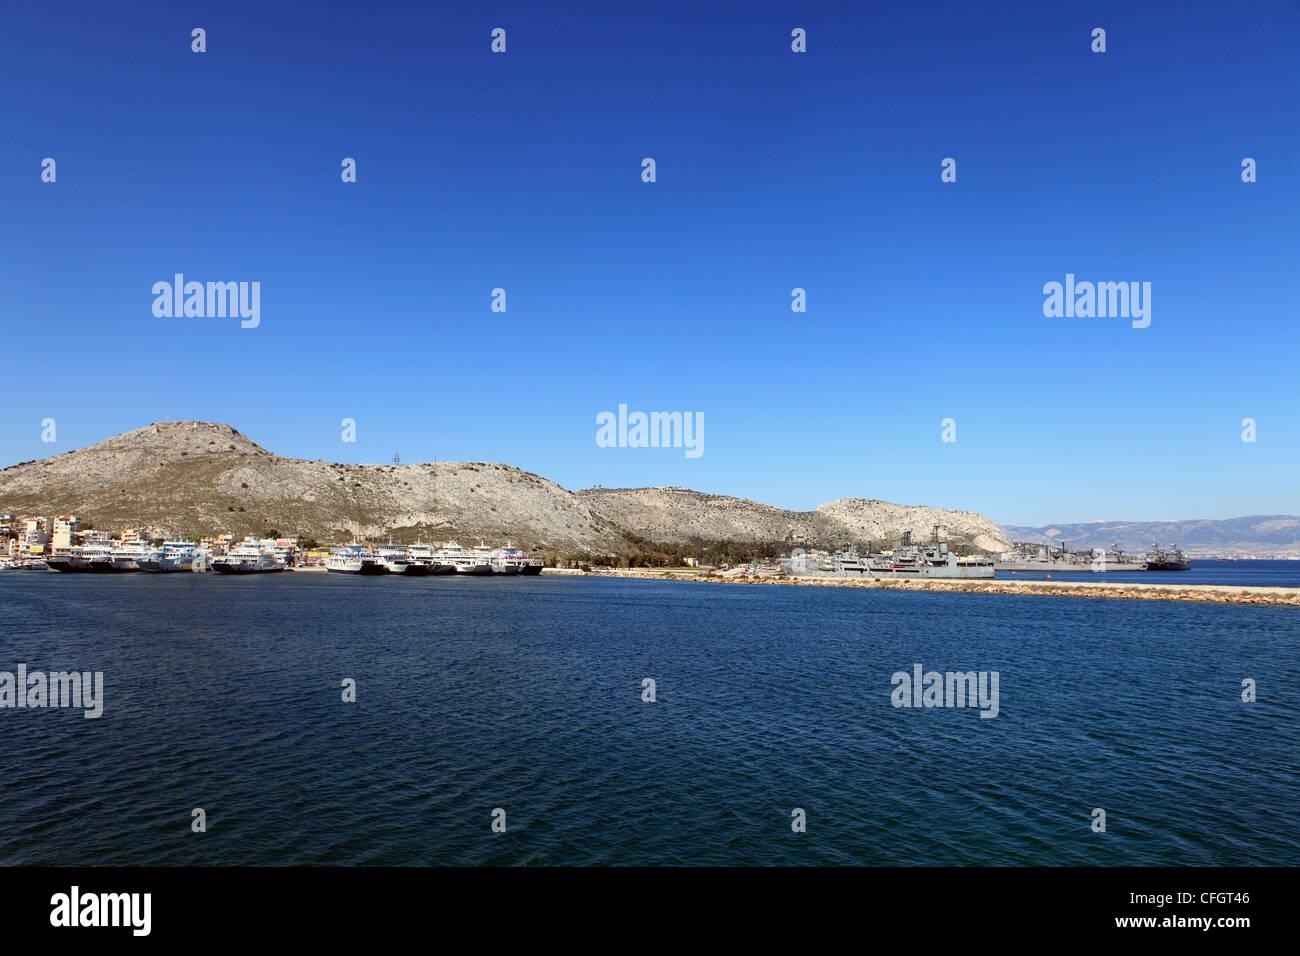 greece saronic islands salamina a view of the port of paloukia and naval base - Stock Image